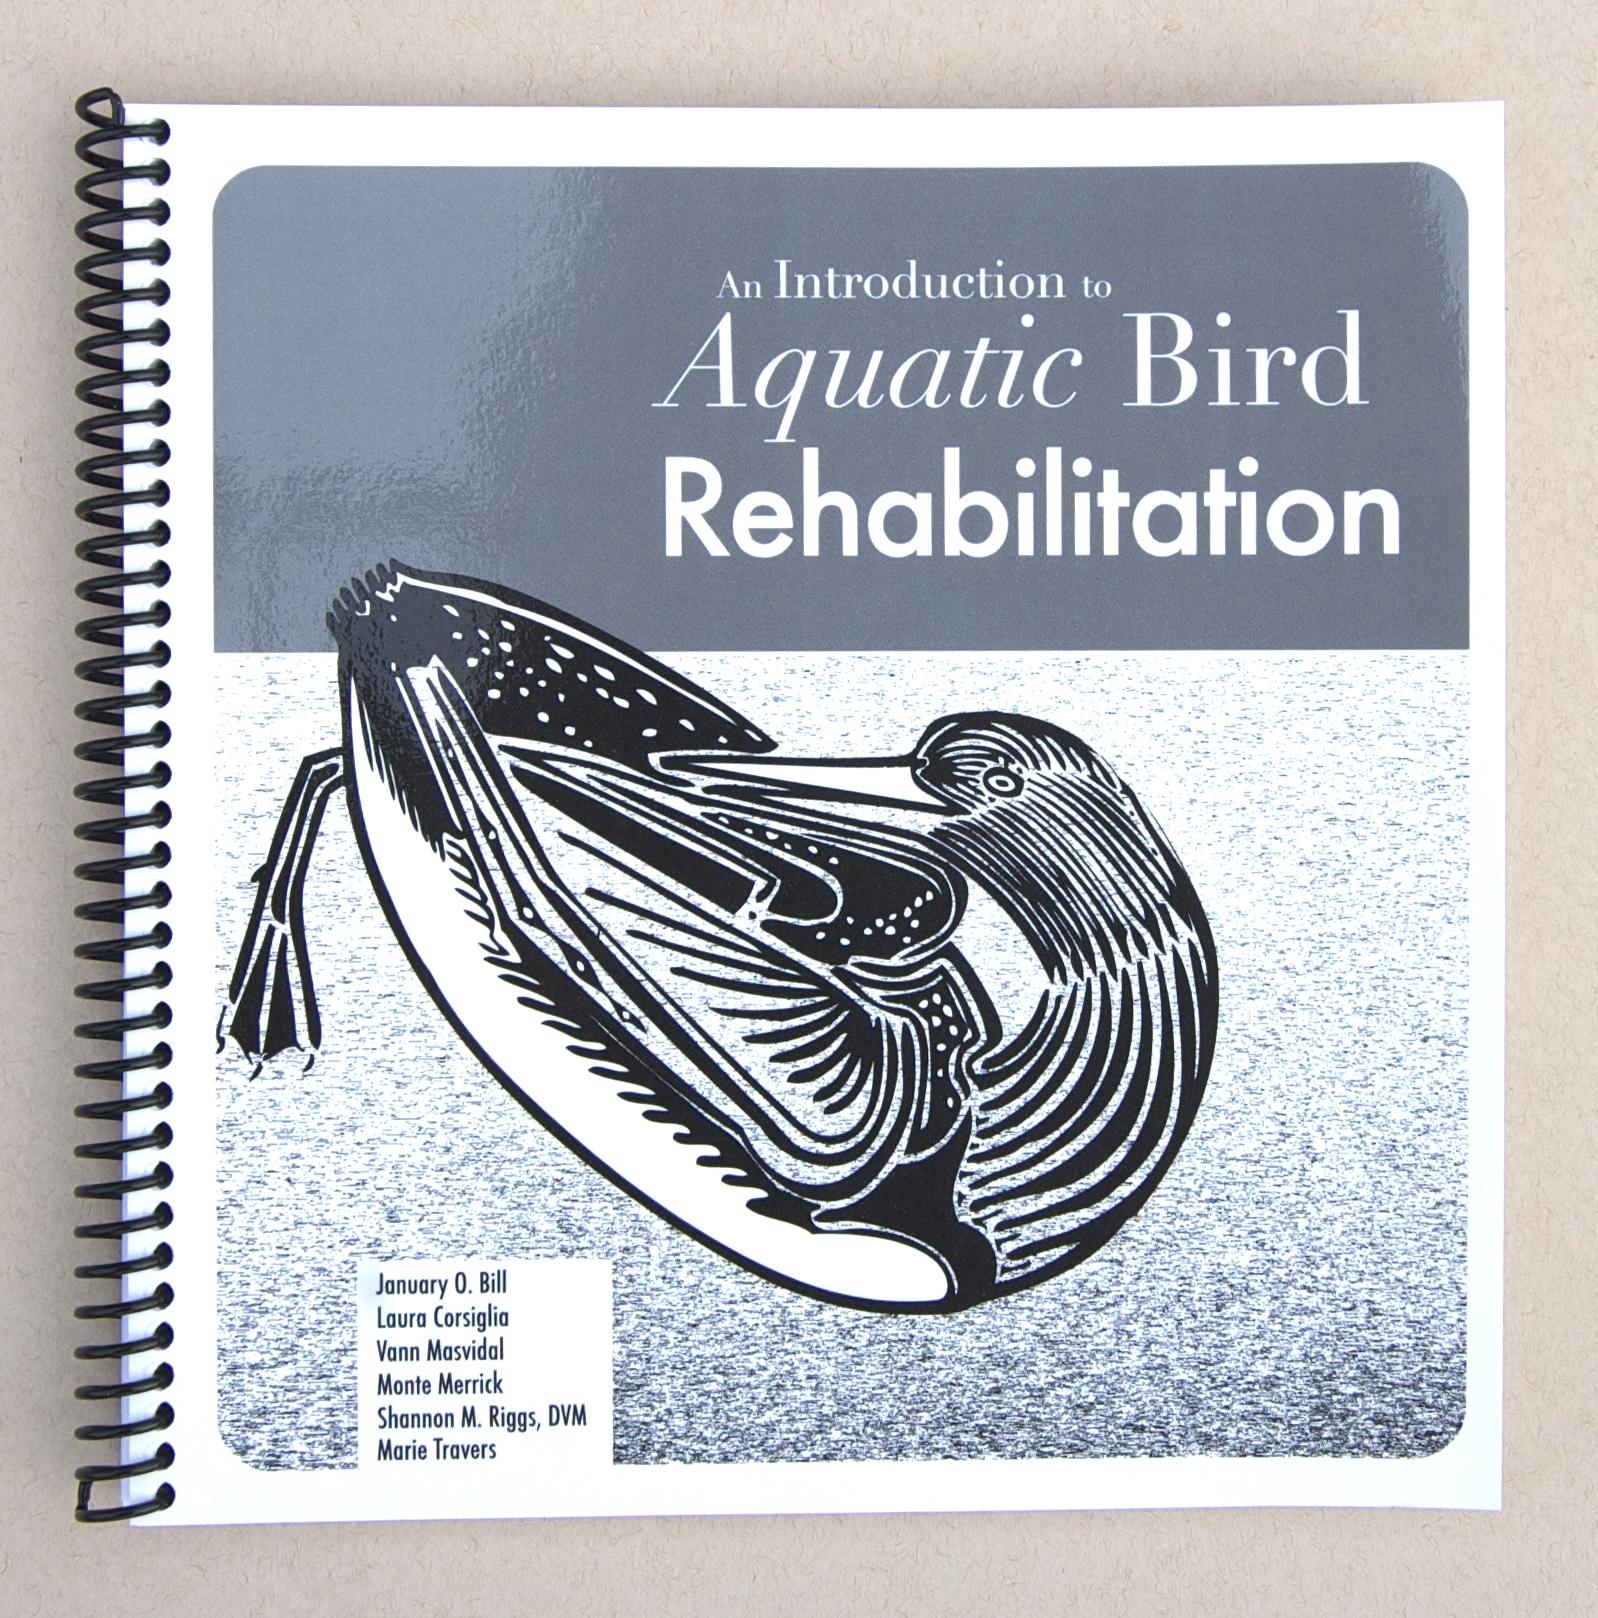 Aquatic Bird Rehabilitation